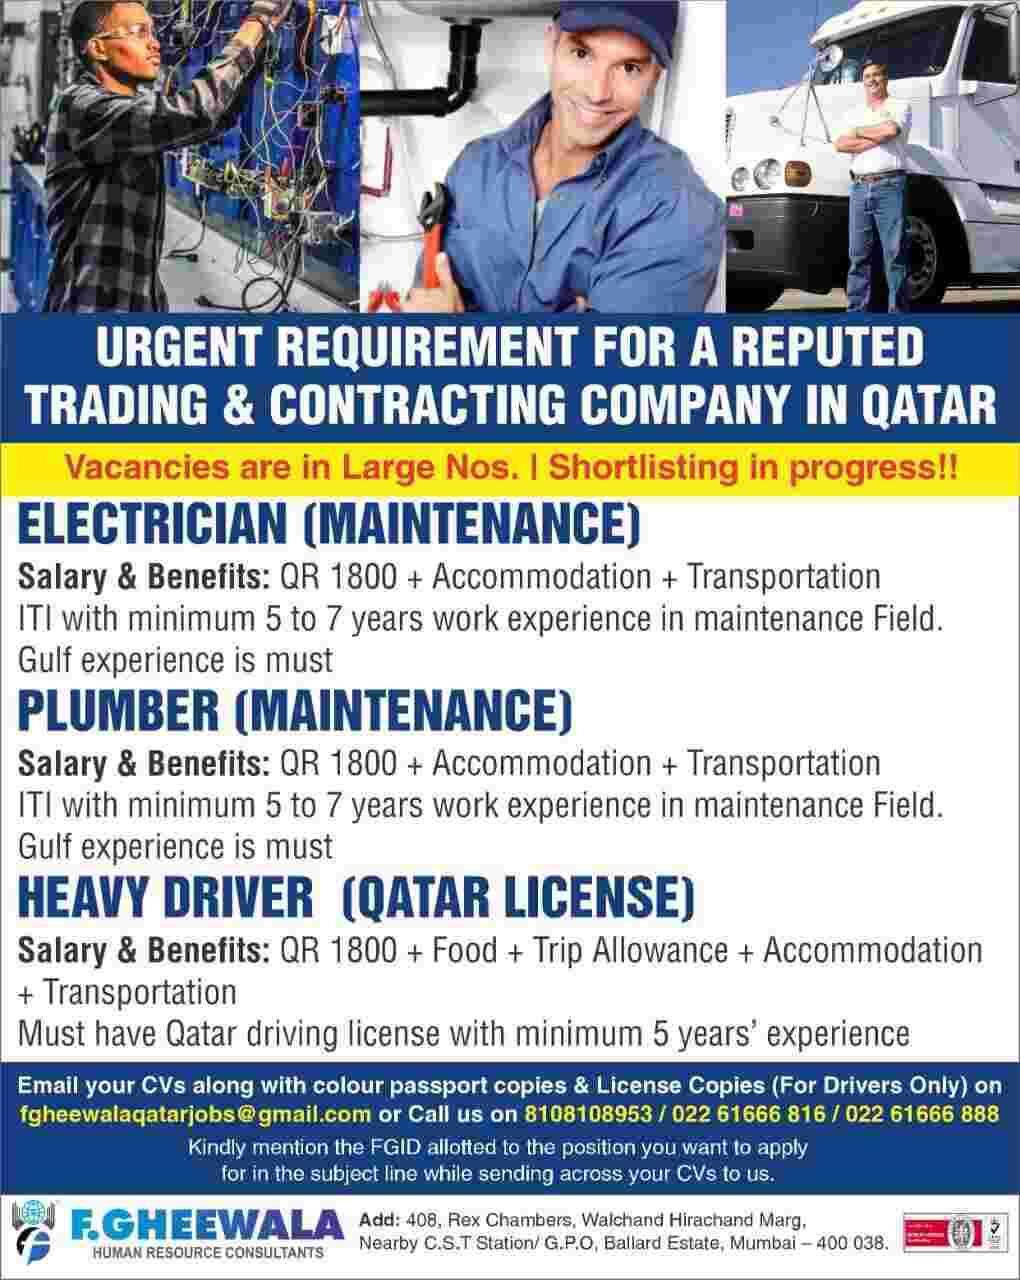 Qatar jobs – Job vacancy for Reputed Trading & Contracting Company in Qatar